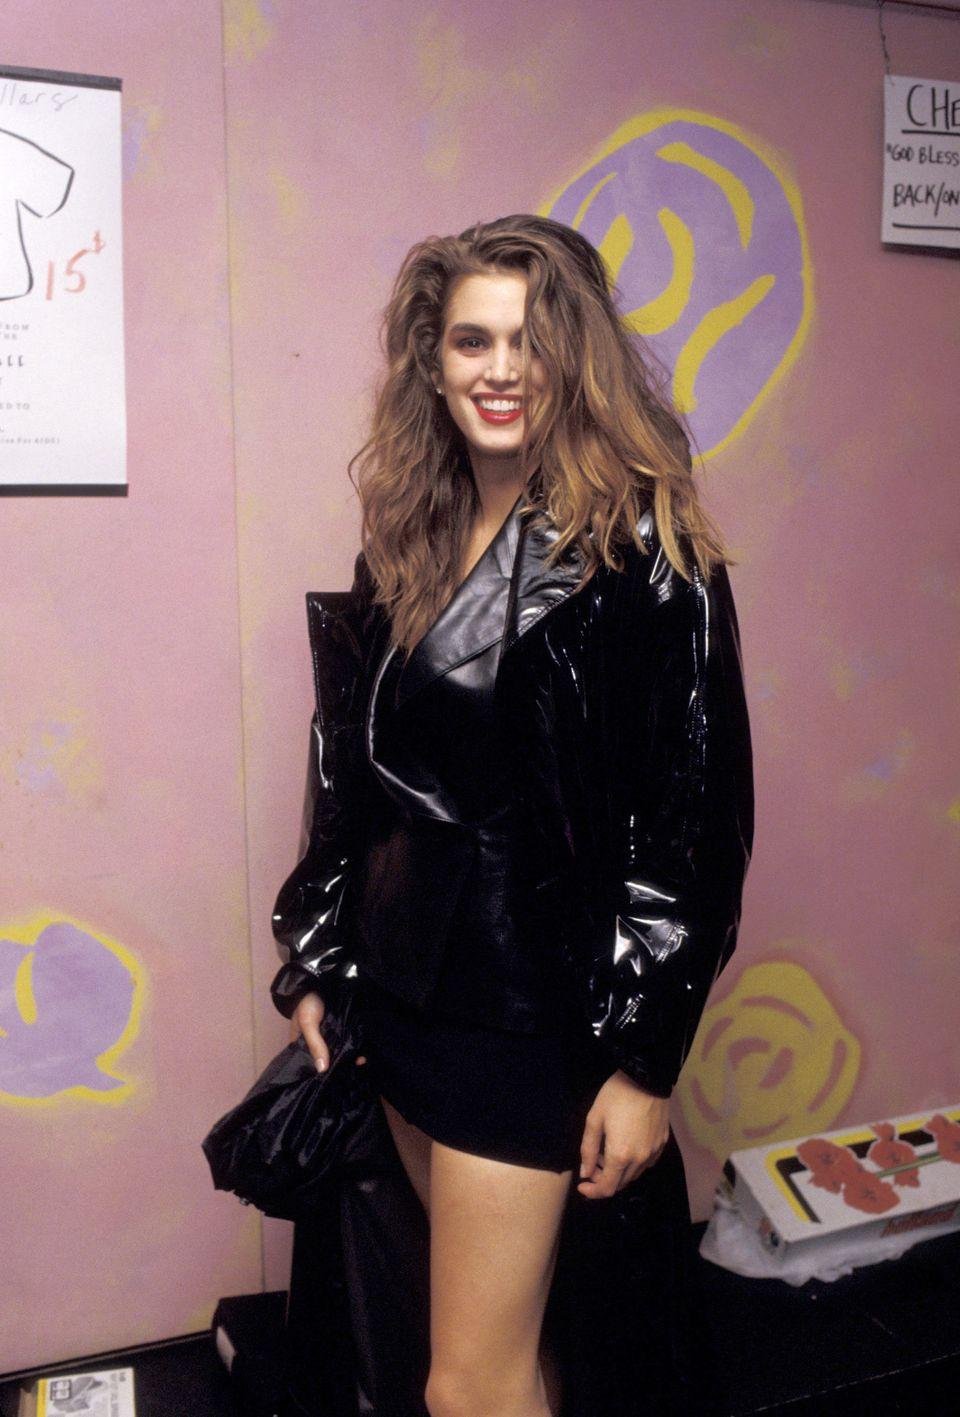 Nailin' the '80s style.